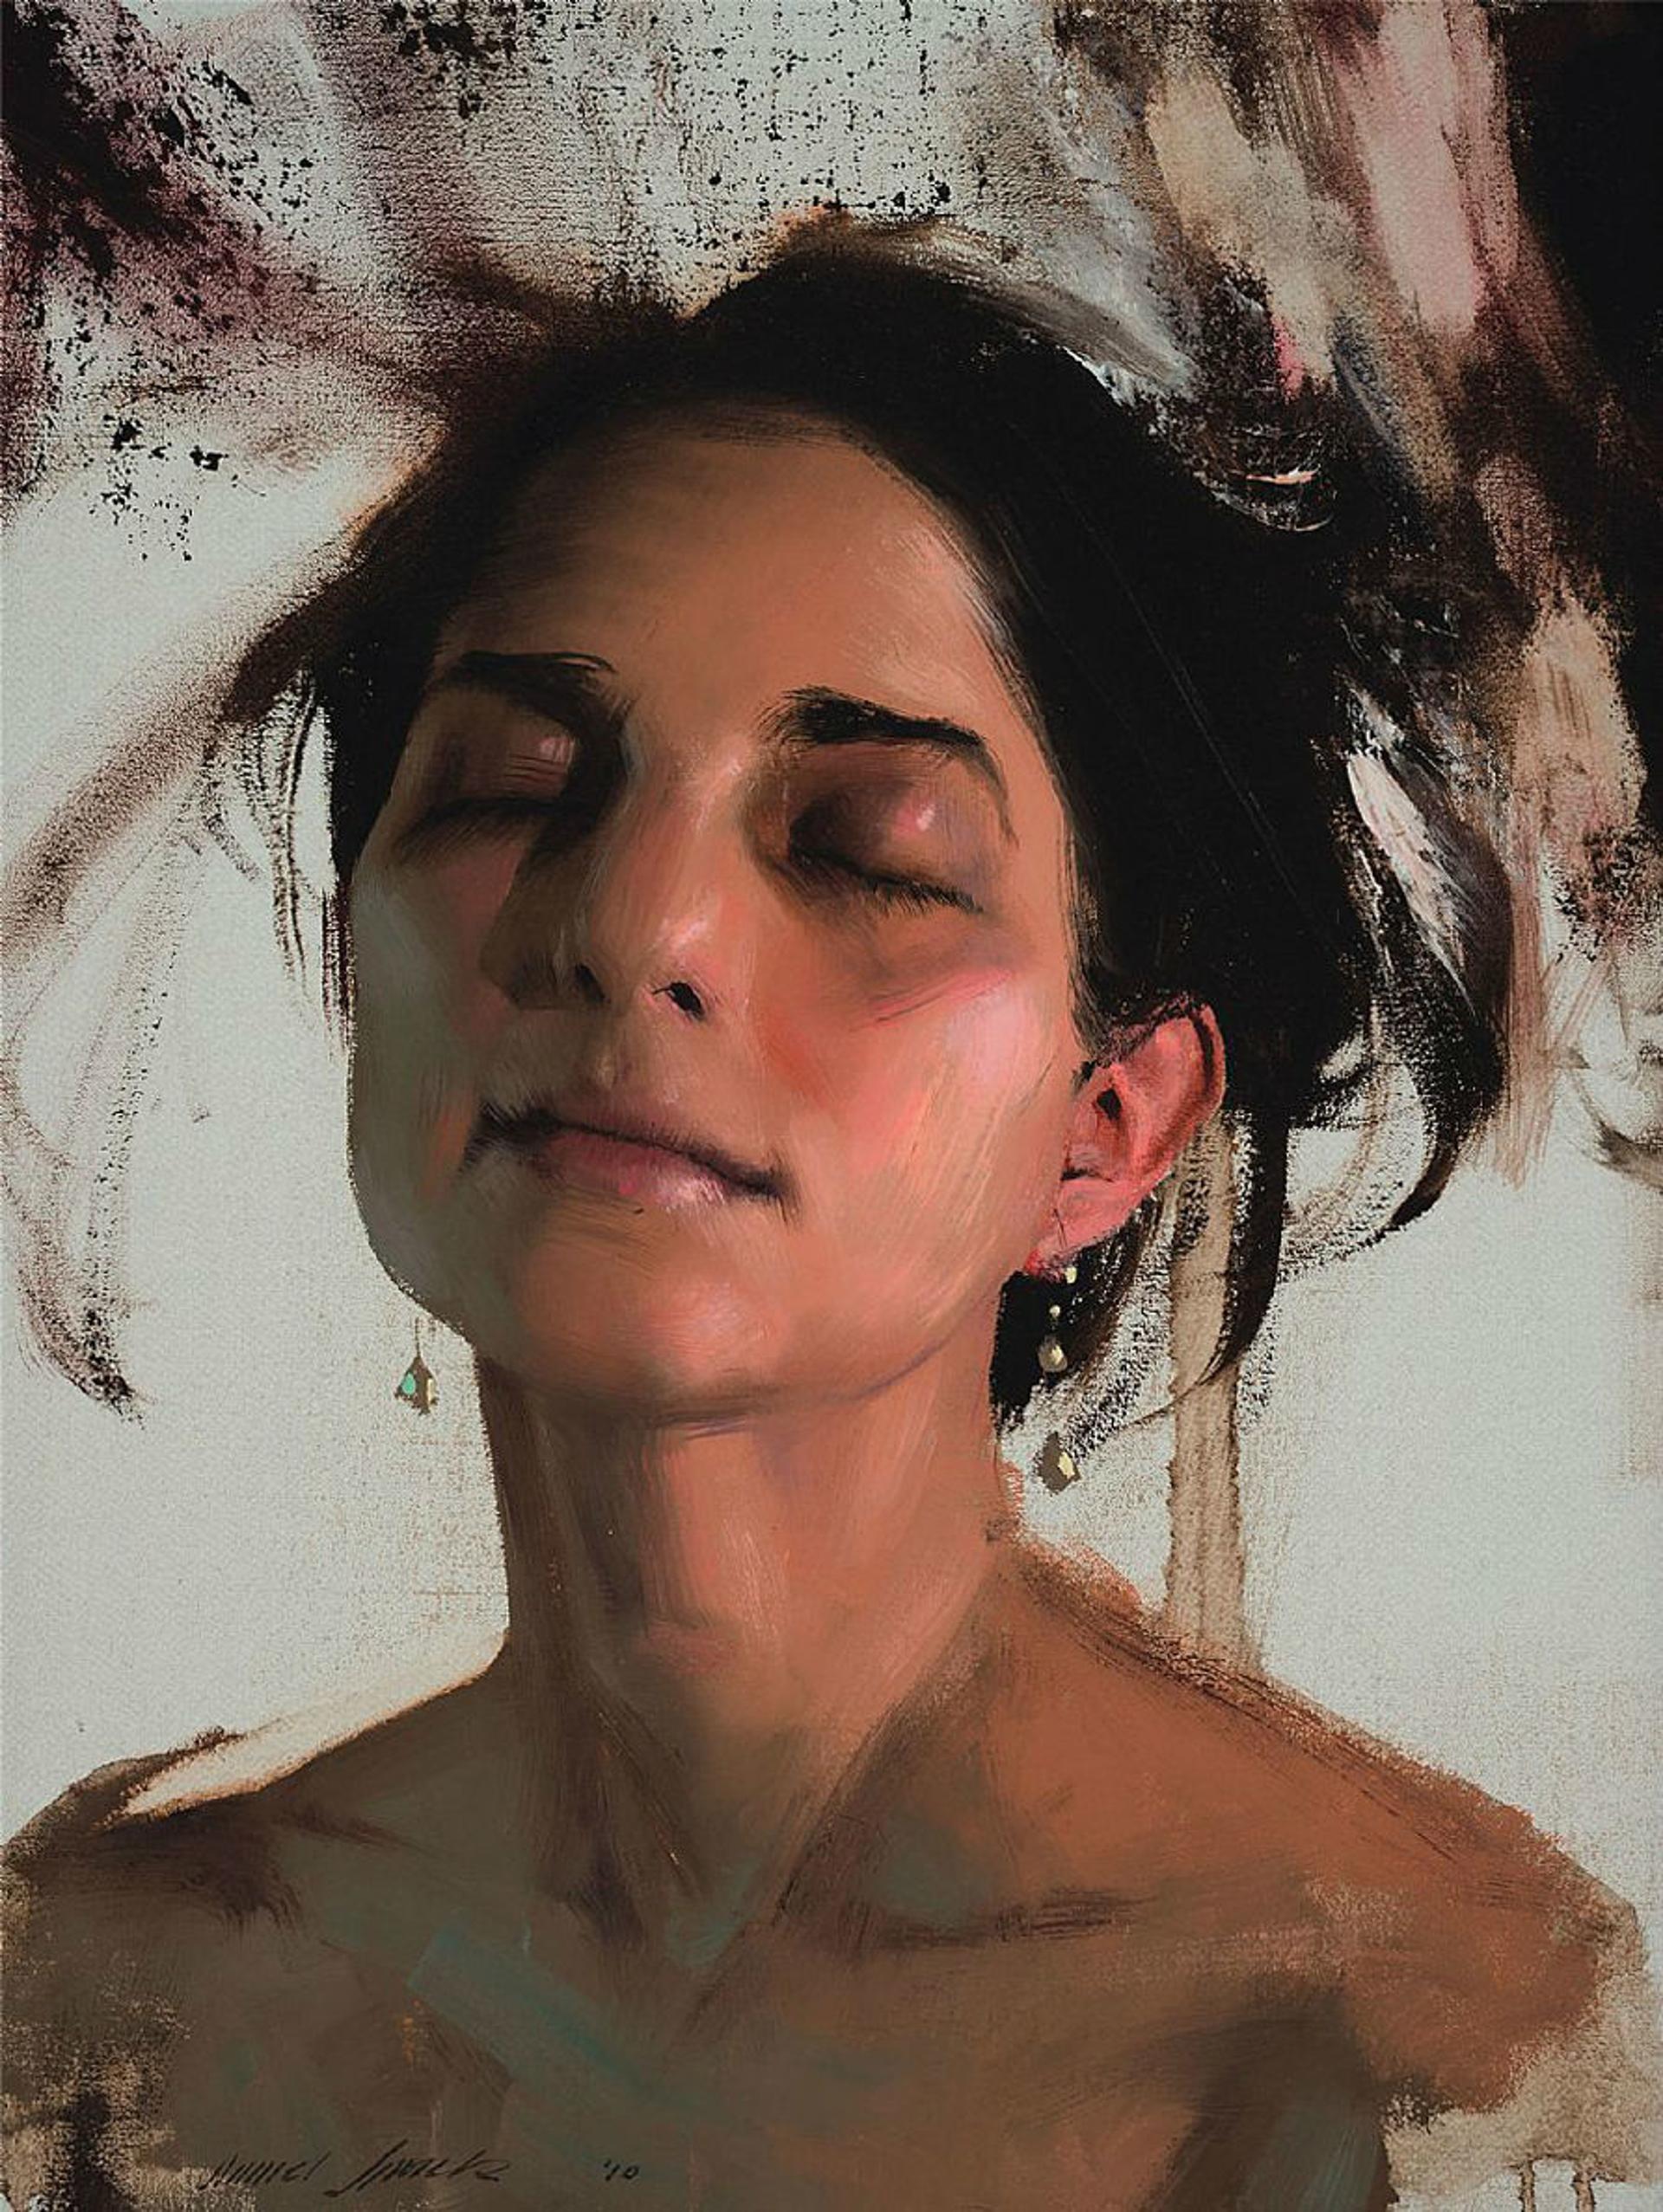 Julia by Daniel Sprick